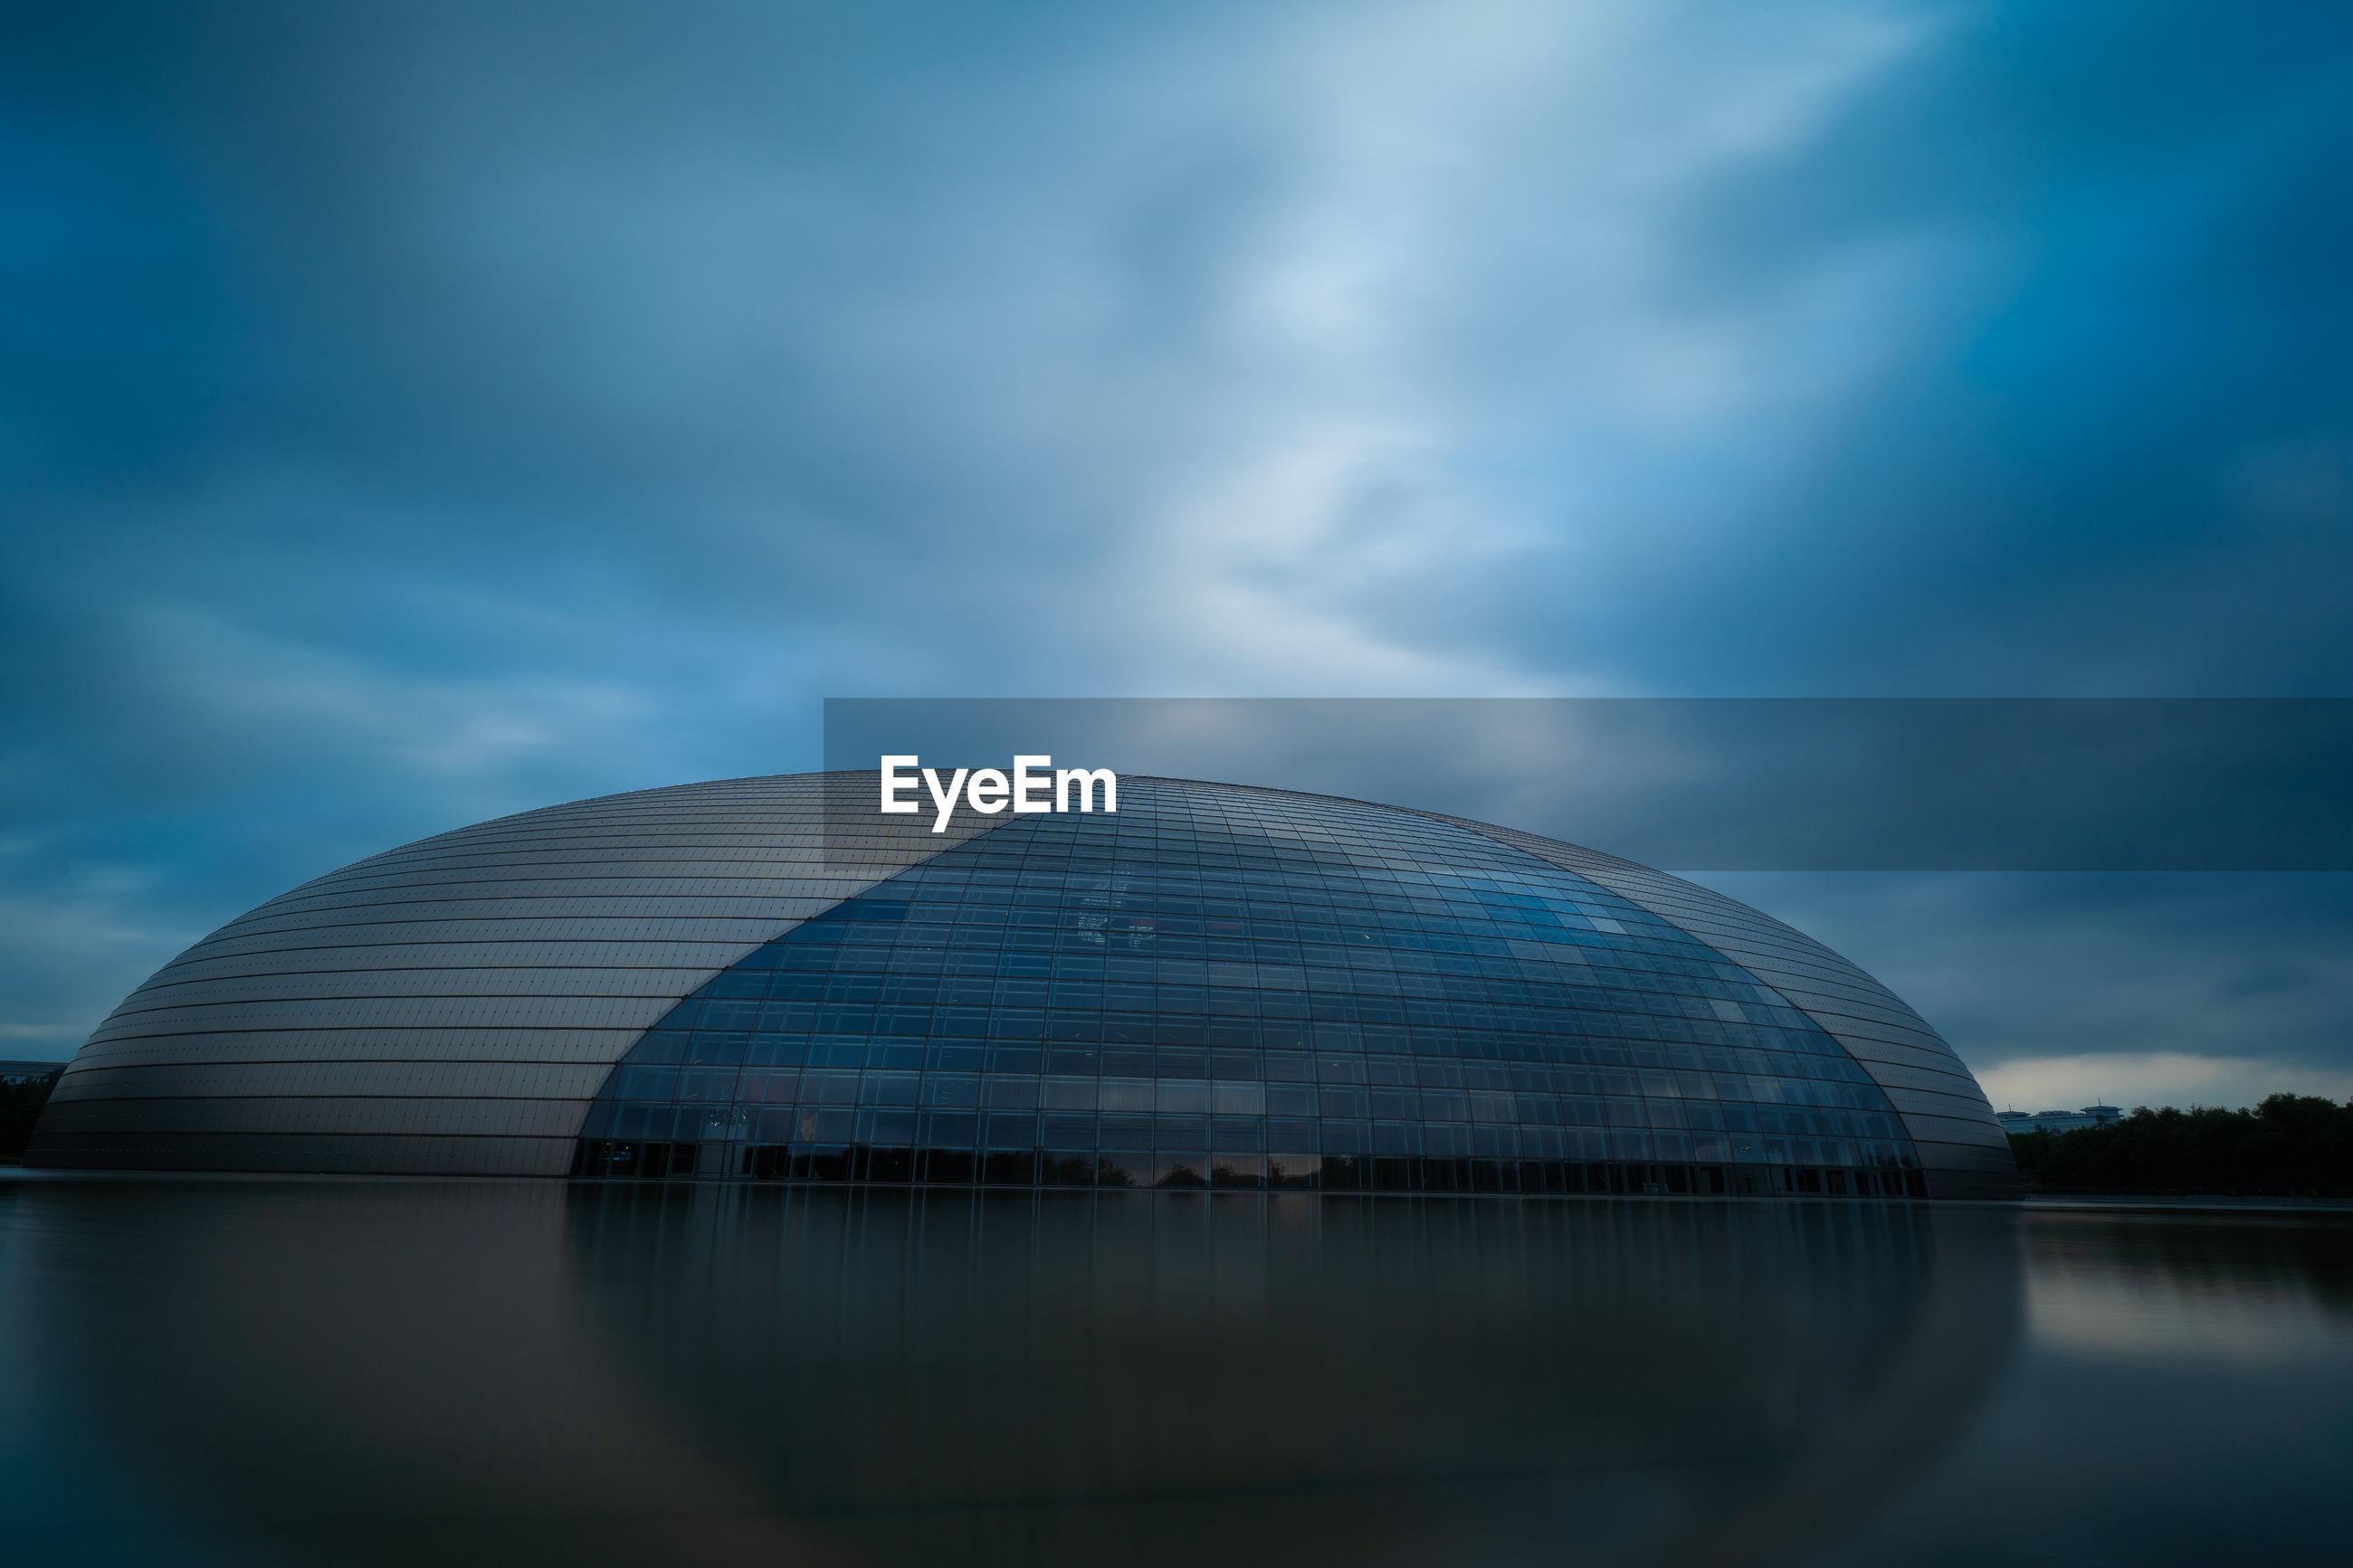 Modern building by lake against overcast sky